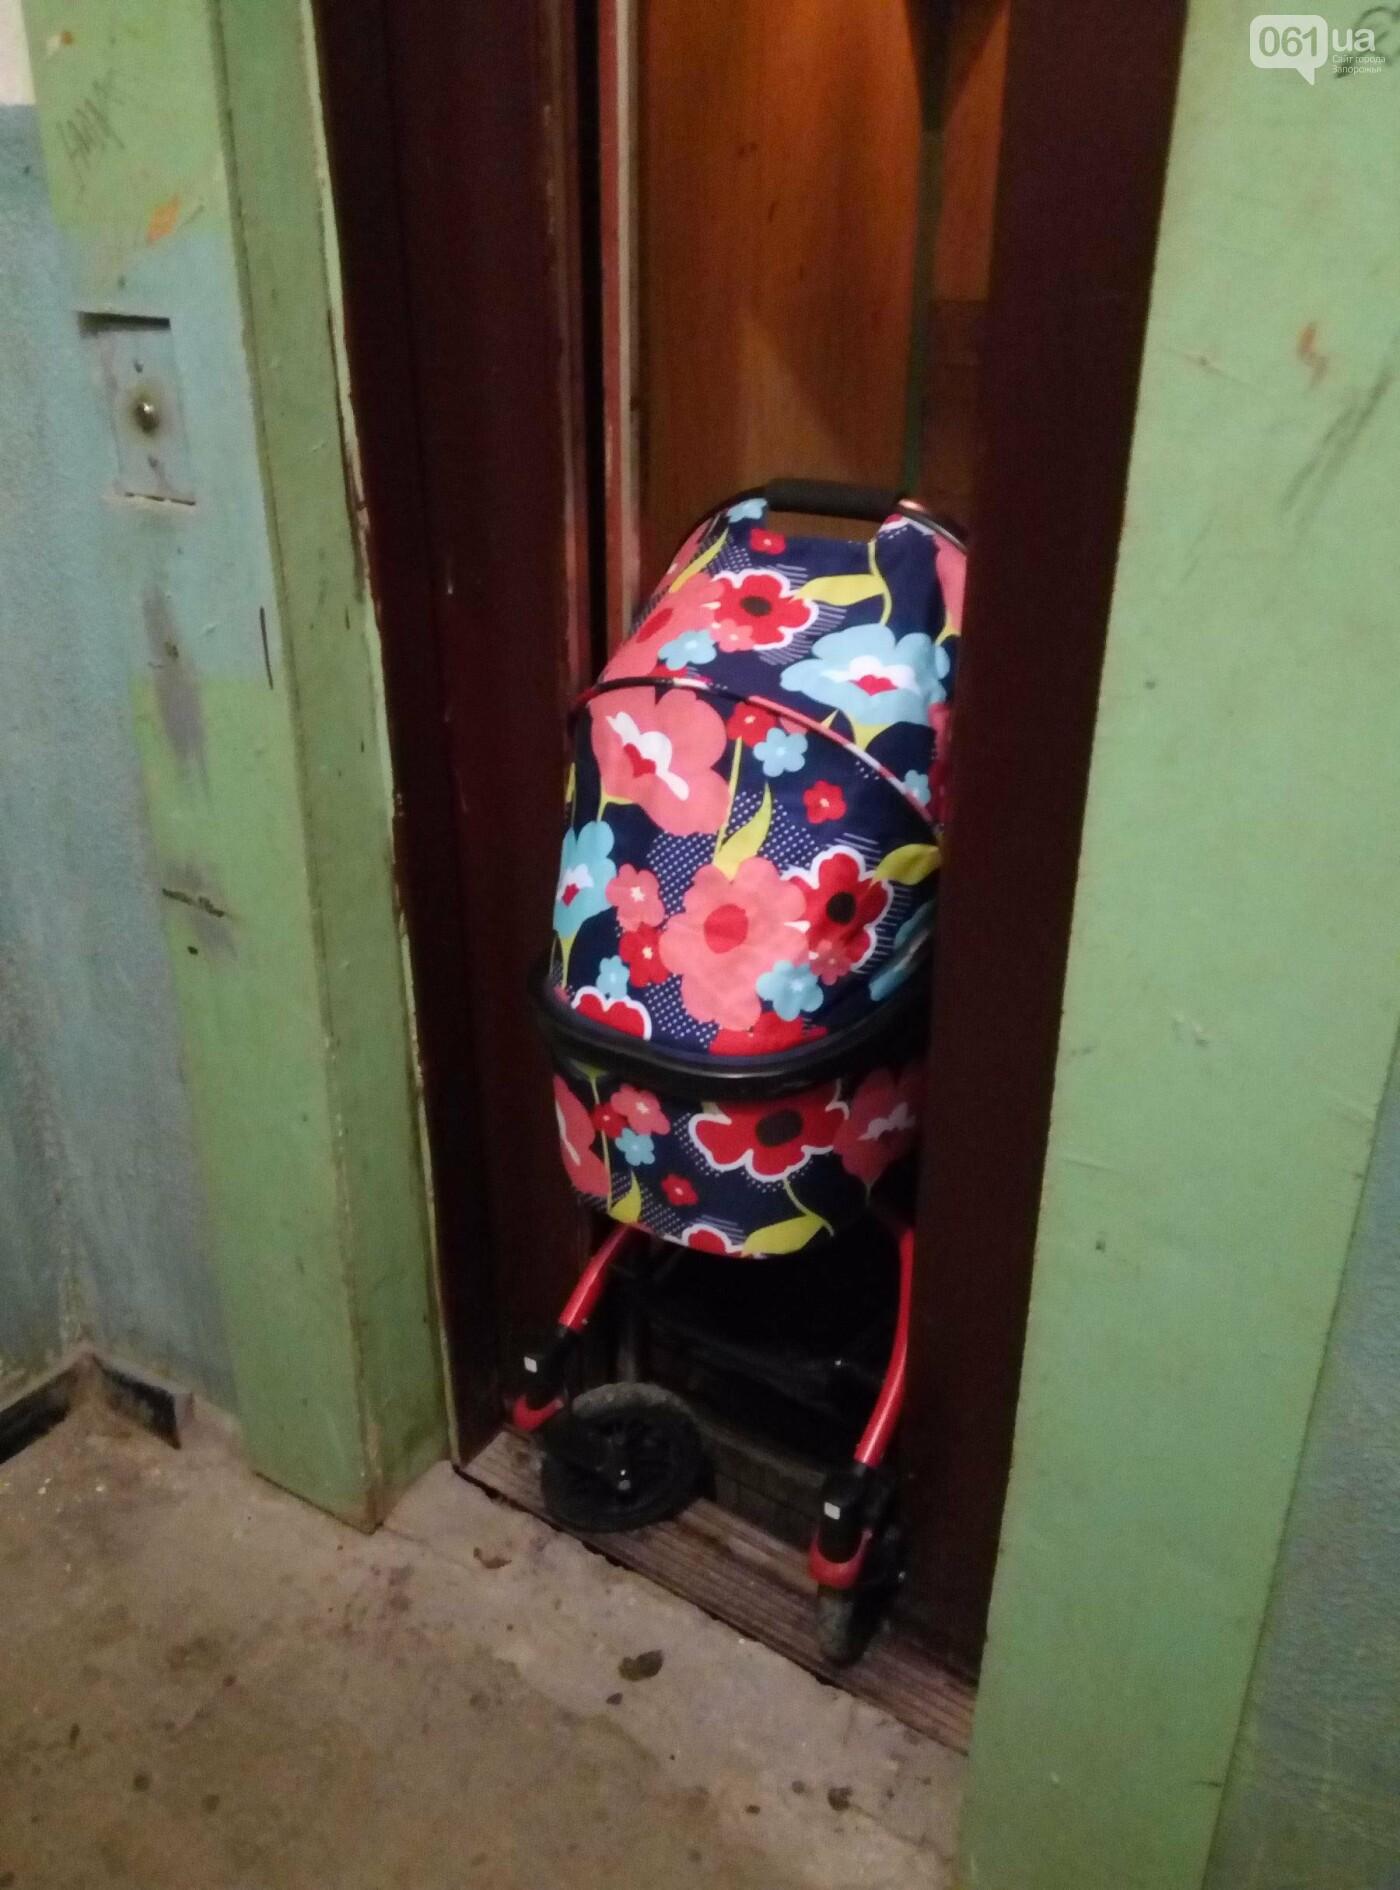 В Запорожье дверьми неисправного лифта зажало коляску с ребенком, - ФОТО , фото-2